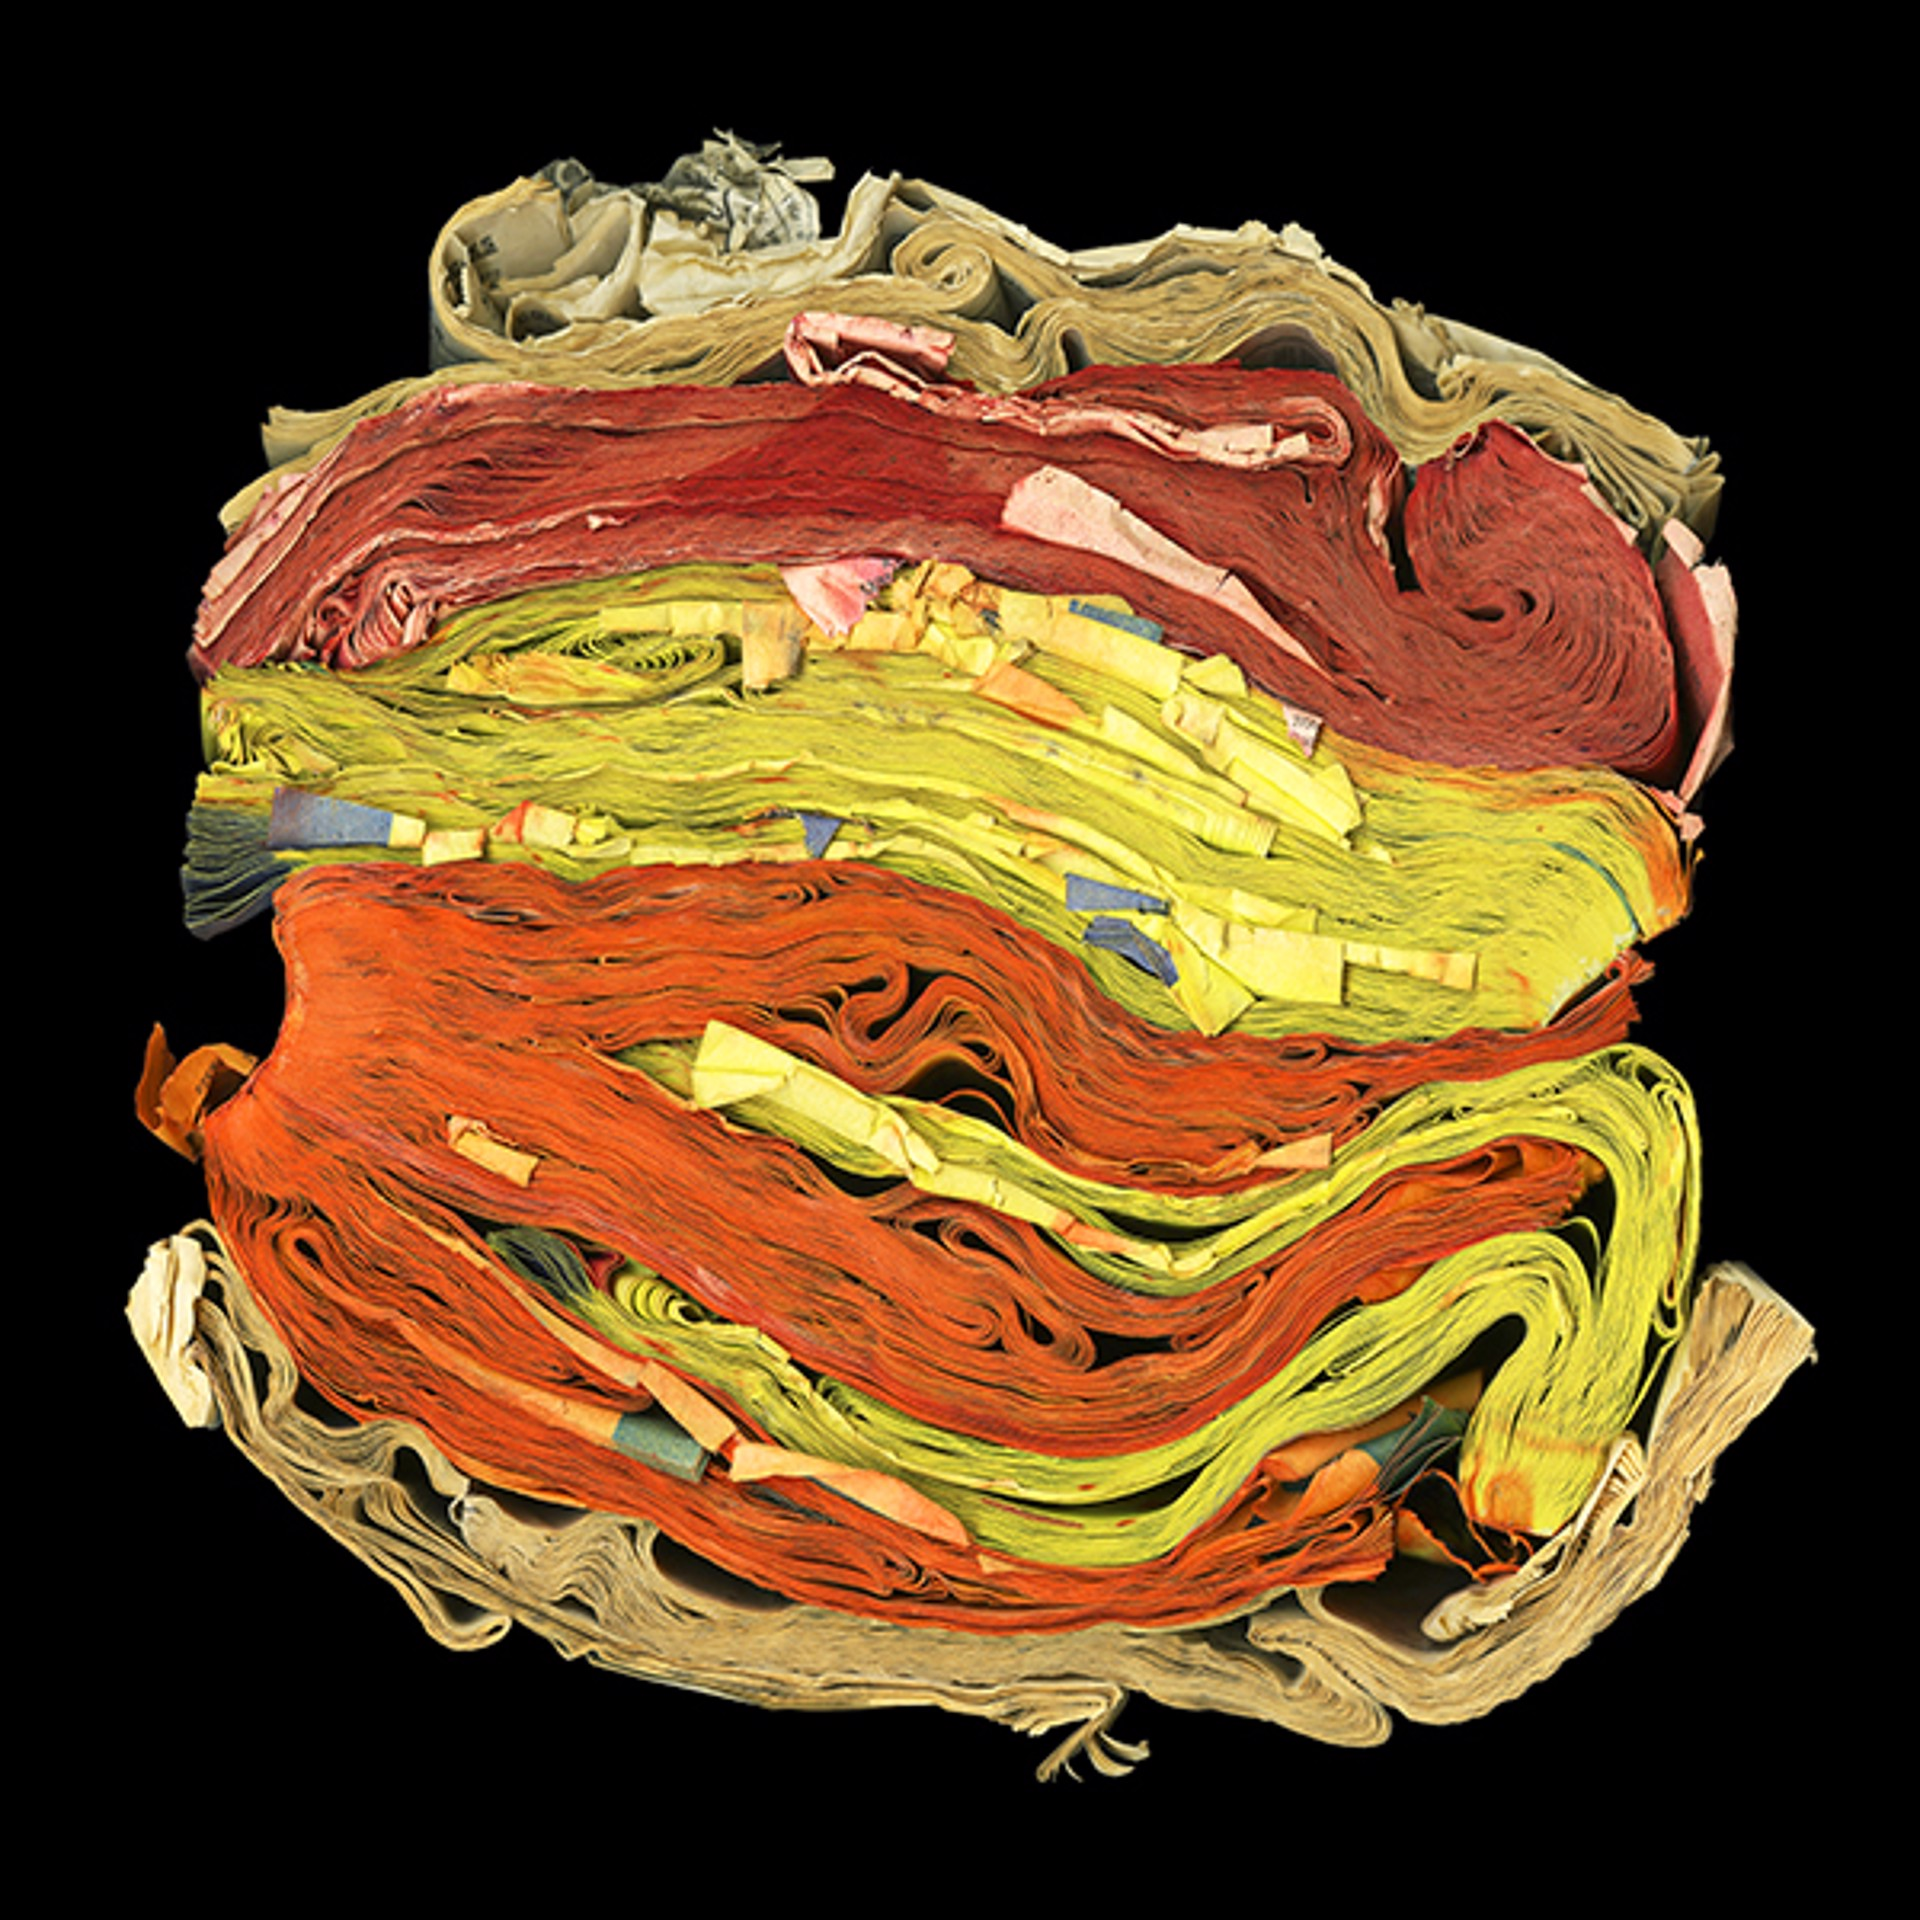 Sandwich by Cara Barer